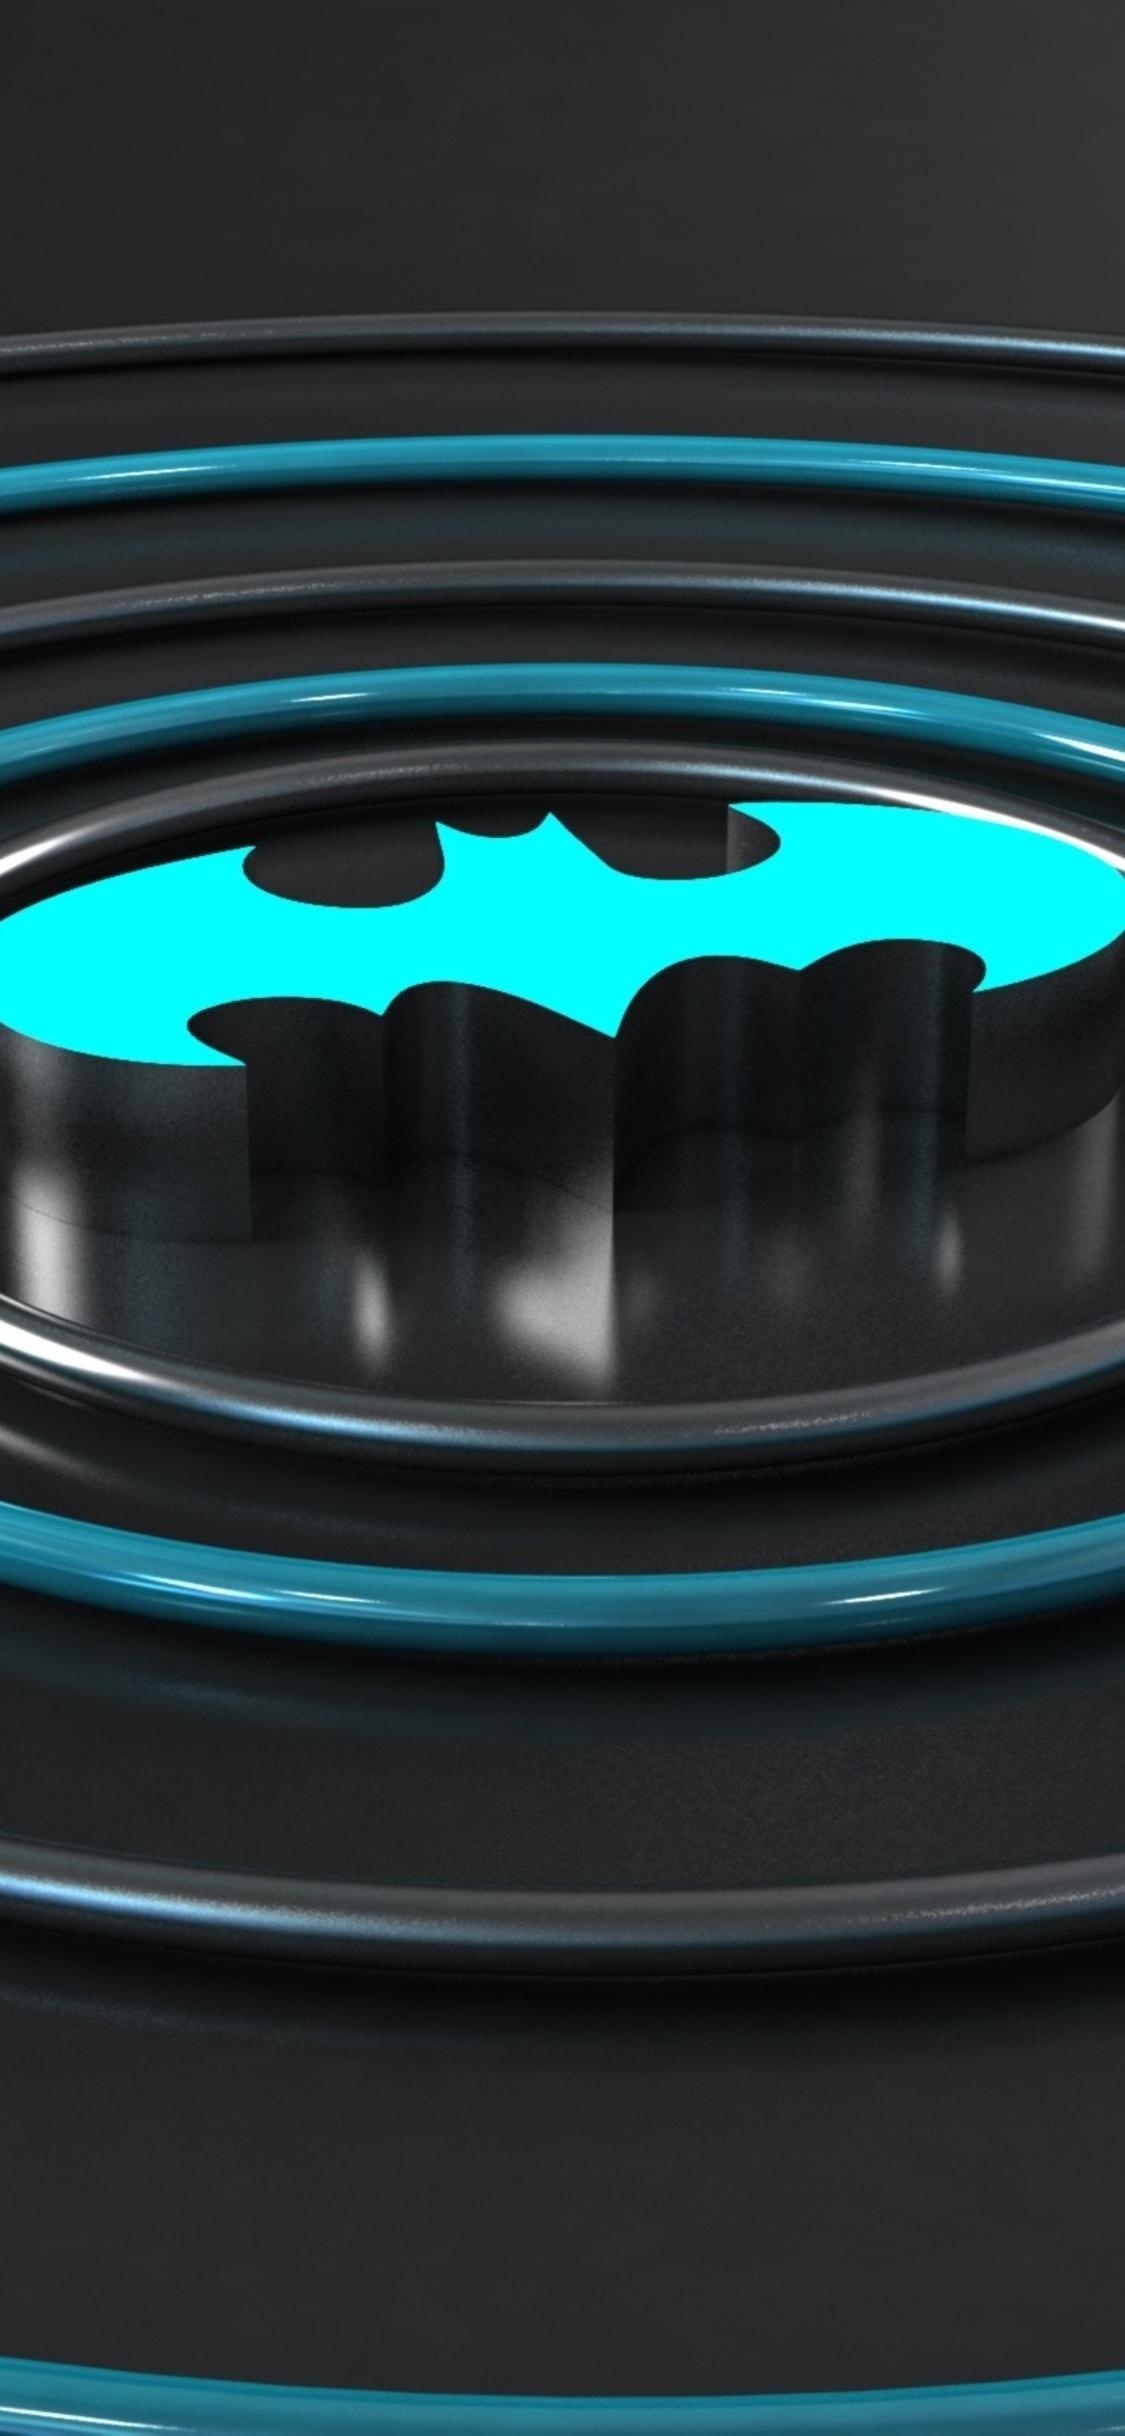 1125x2436 Batman Logo 3d Iphone XS Iphone 10 Iphone X HD 4k